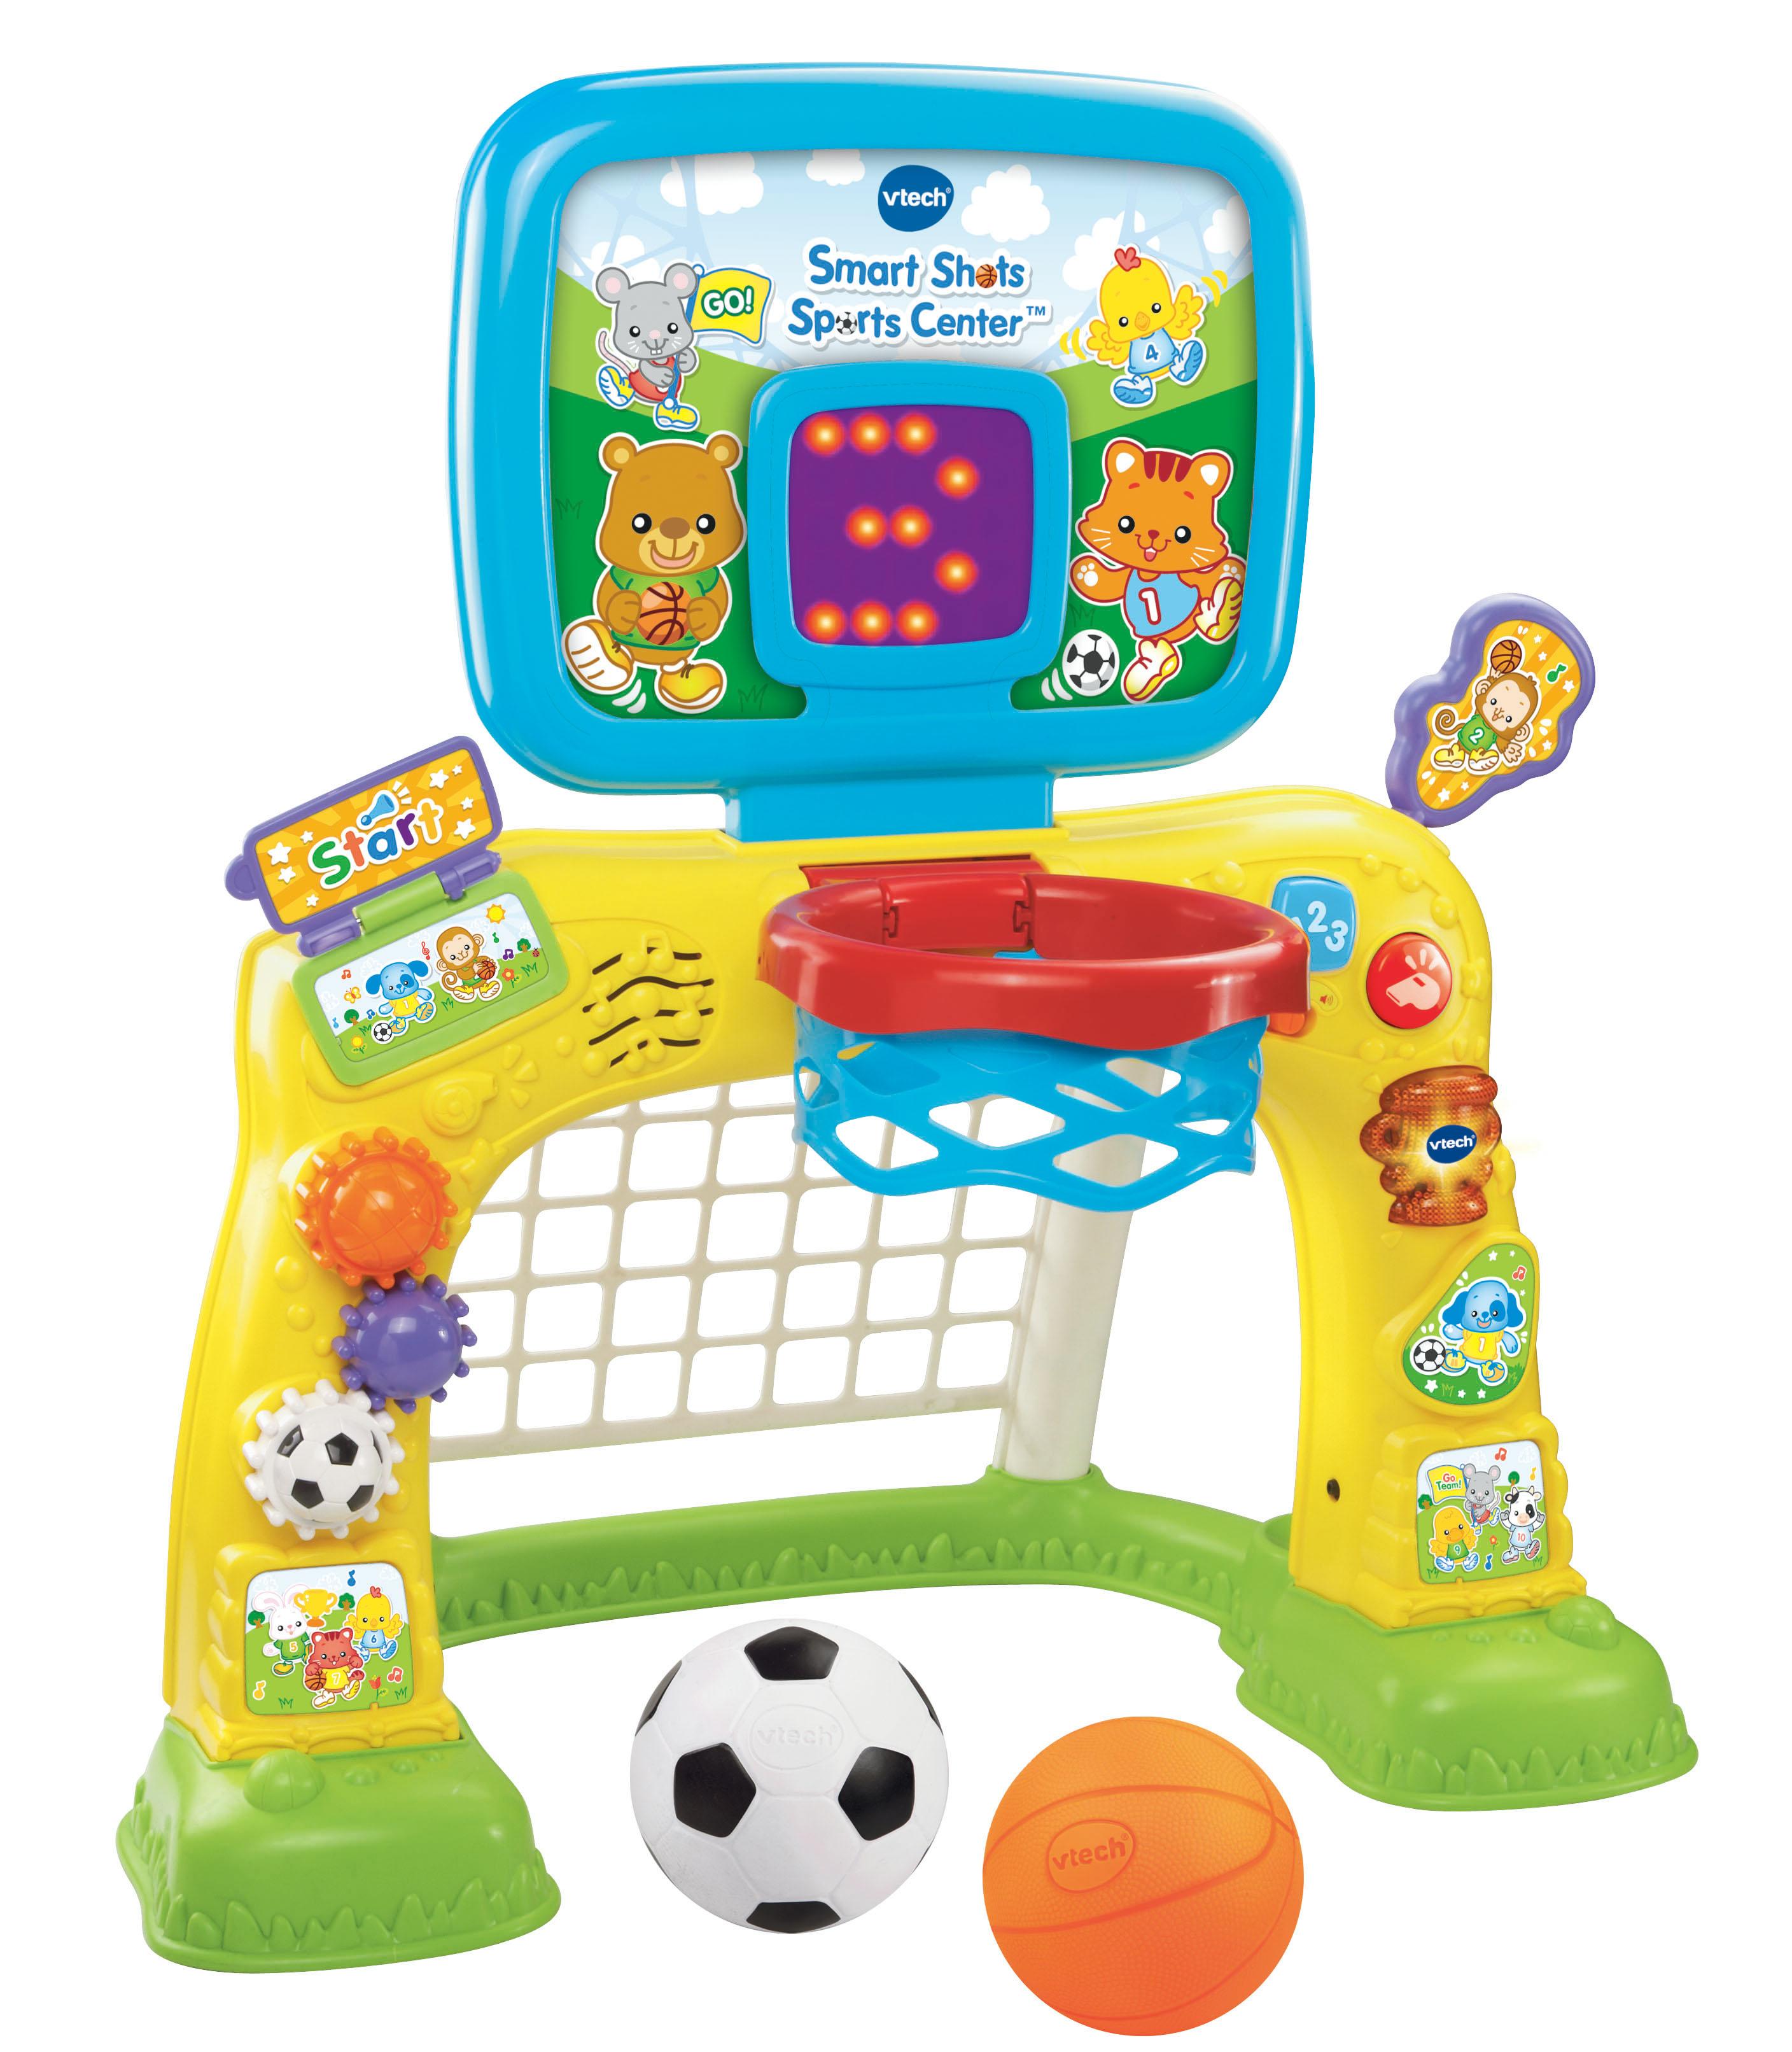 VTech Smart Shots Sports Center Toys for Boys\u0027 Ages 3 - 4